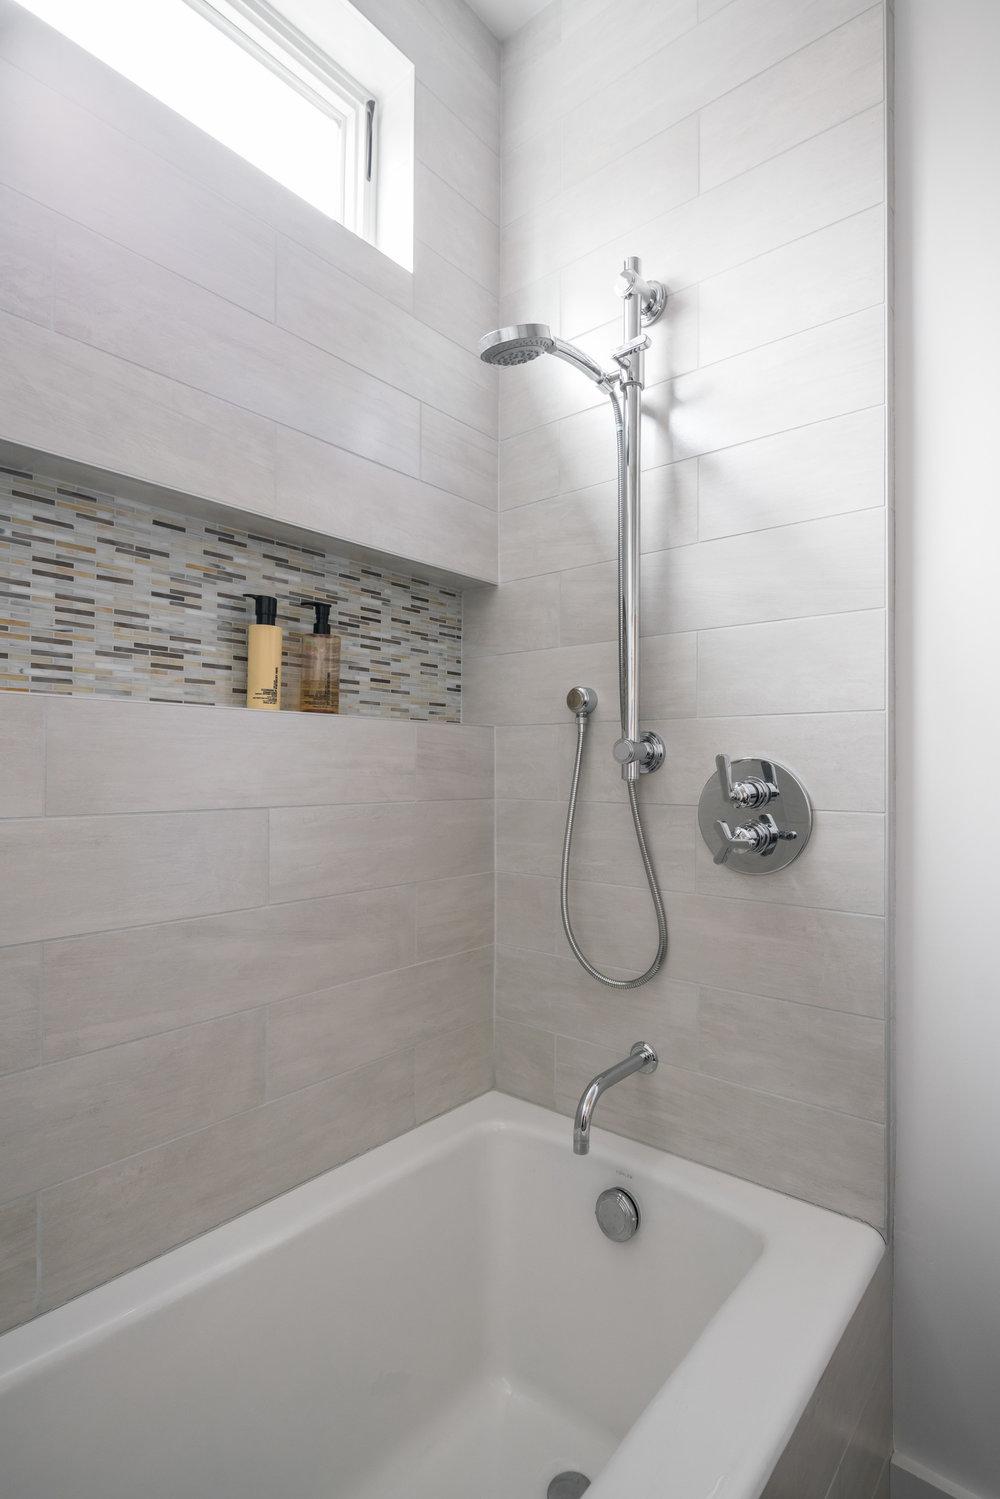 160113_Eisenman_Arch_Merced_Bath1_ShowerDetail.jpg